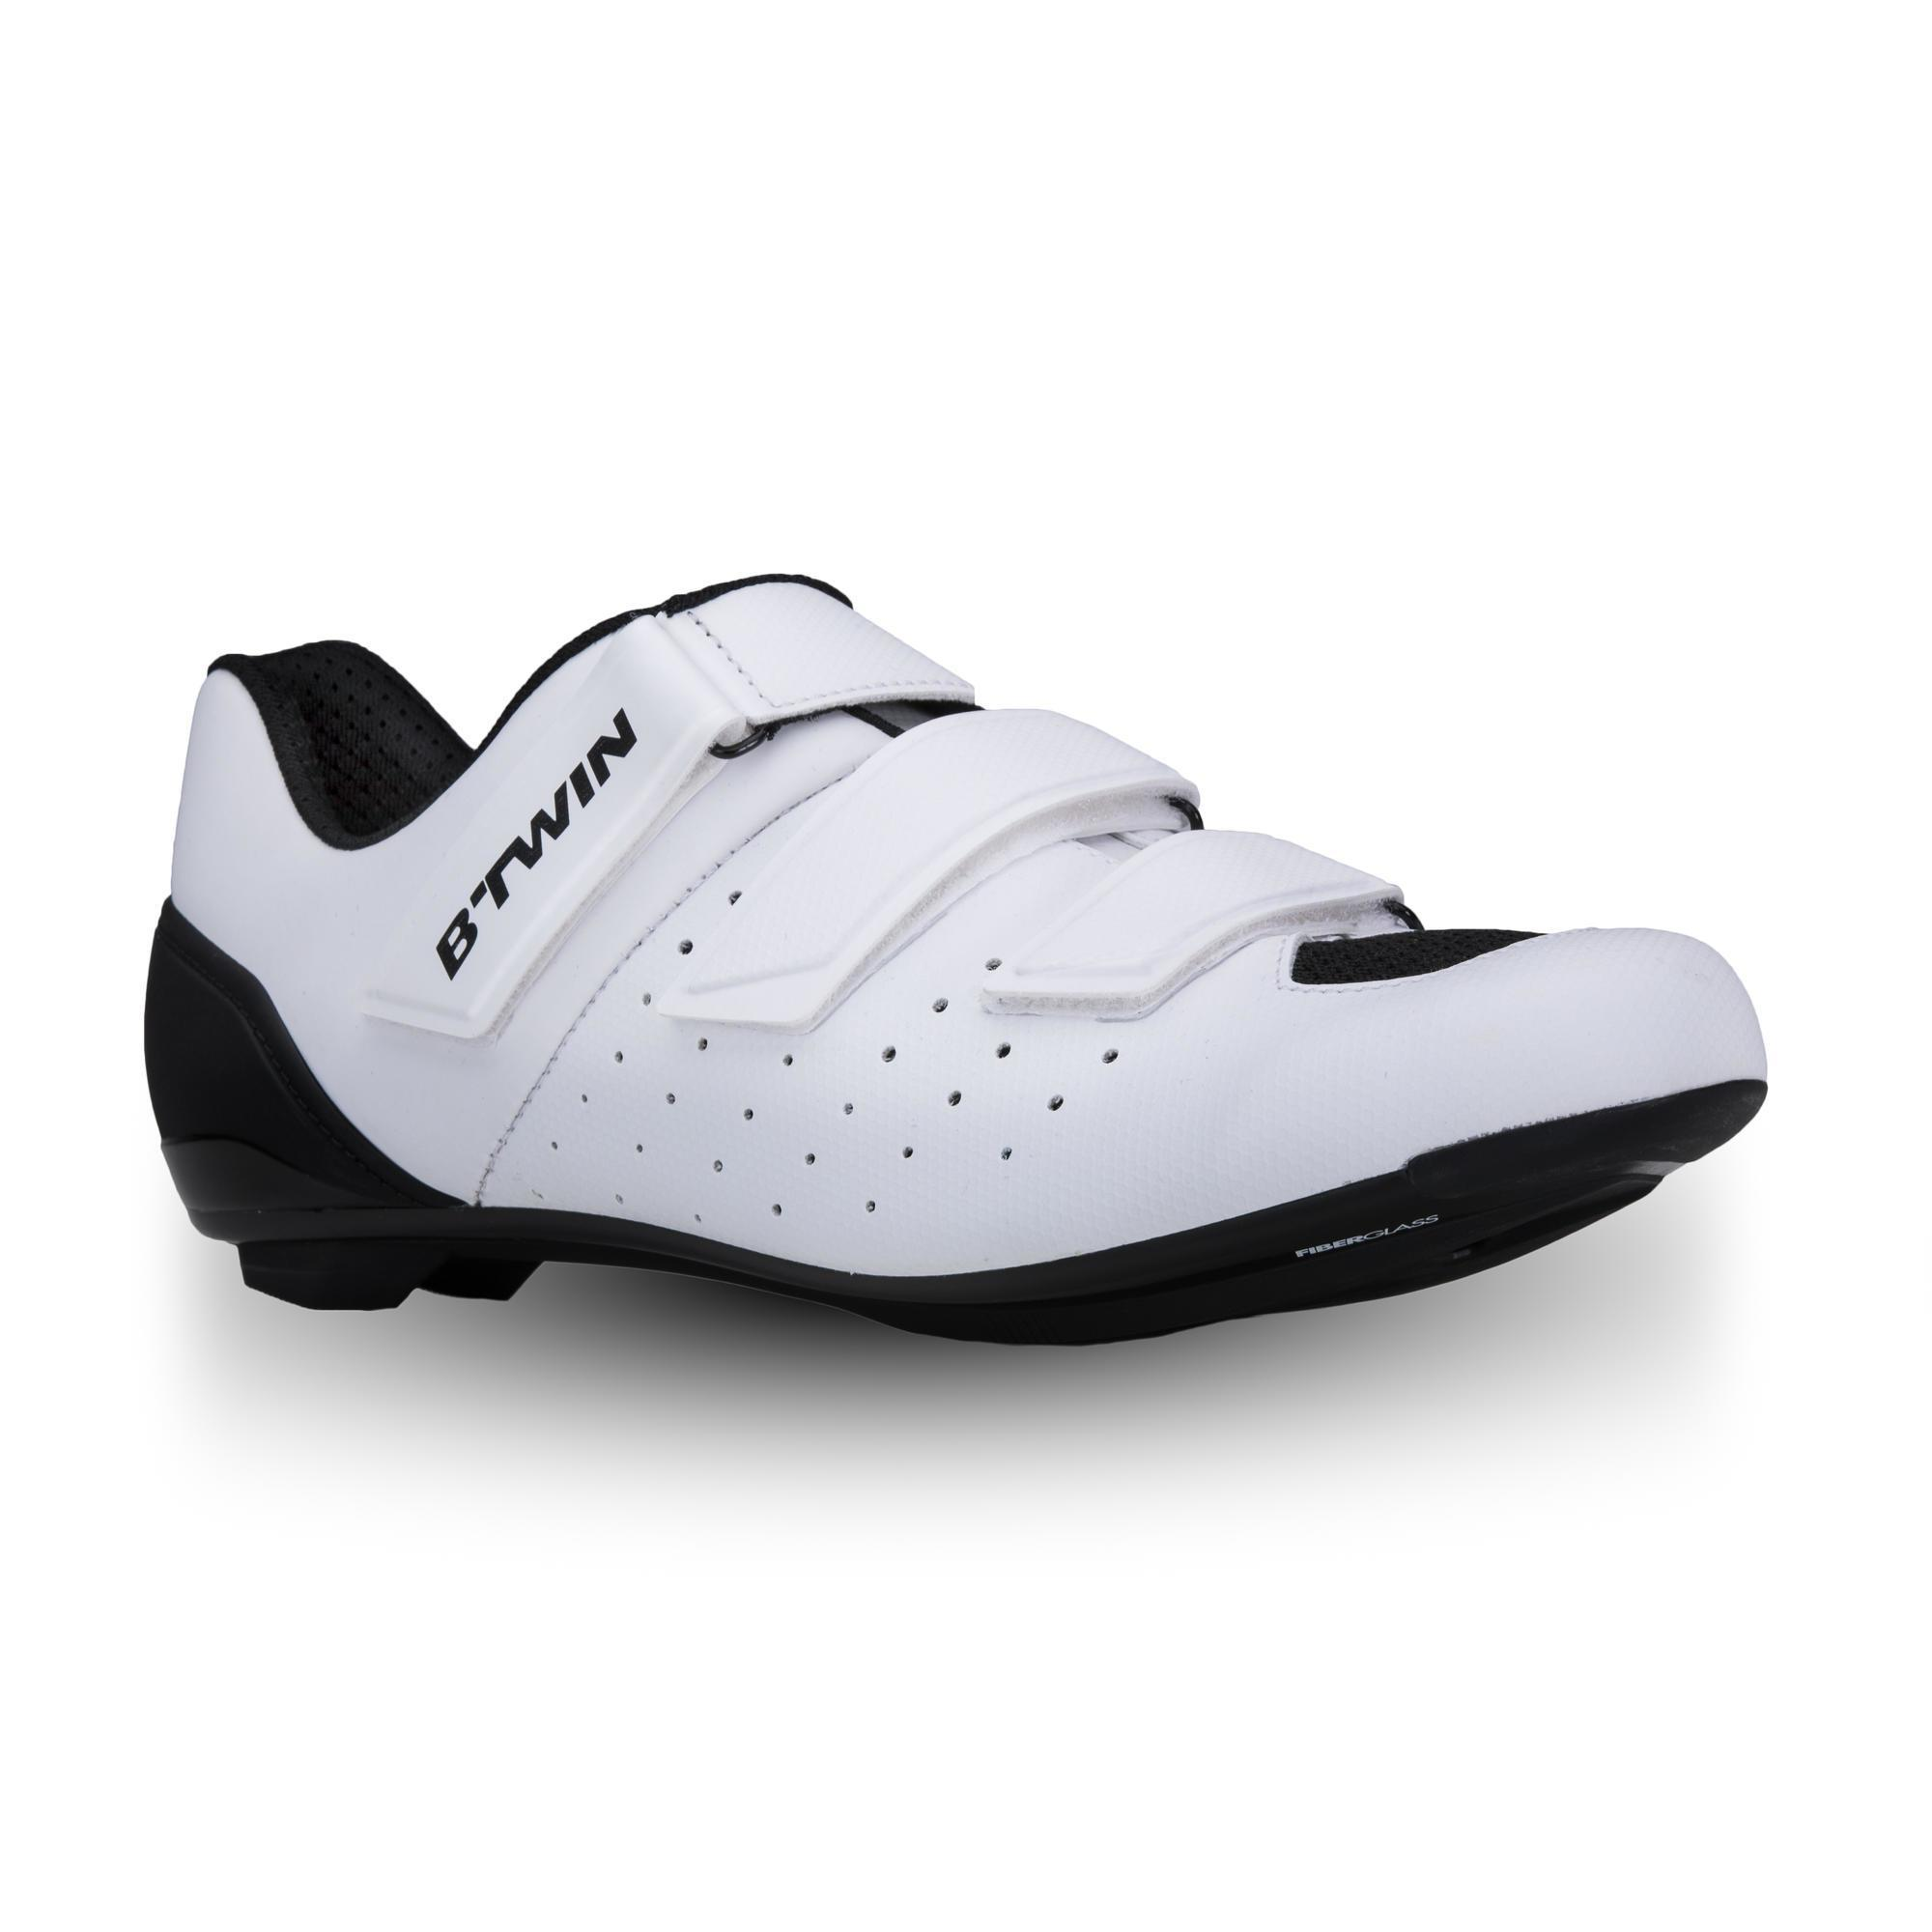 Fahrradschuhe Rennrad 500 weiß | Schuhe > Sportschuhe > Fahrradschuhe | Weiß | B´twin